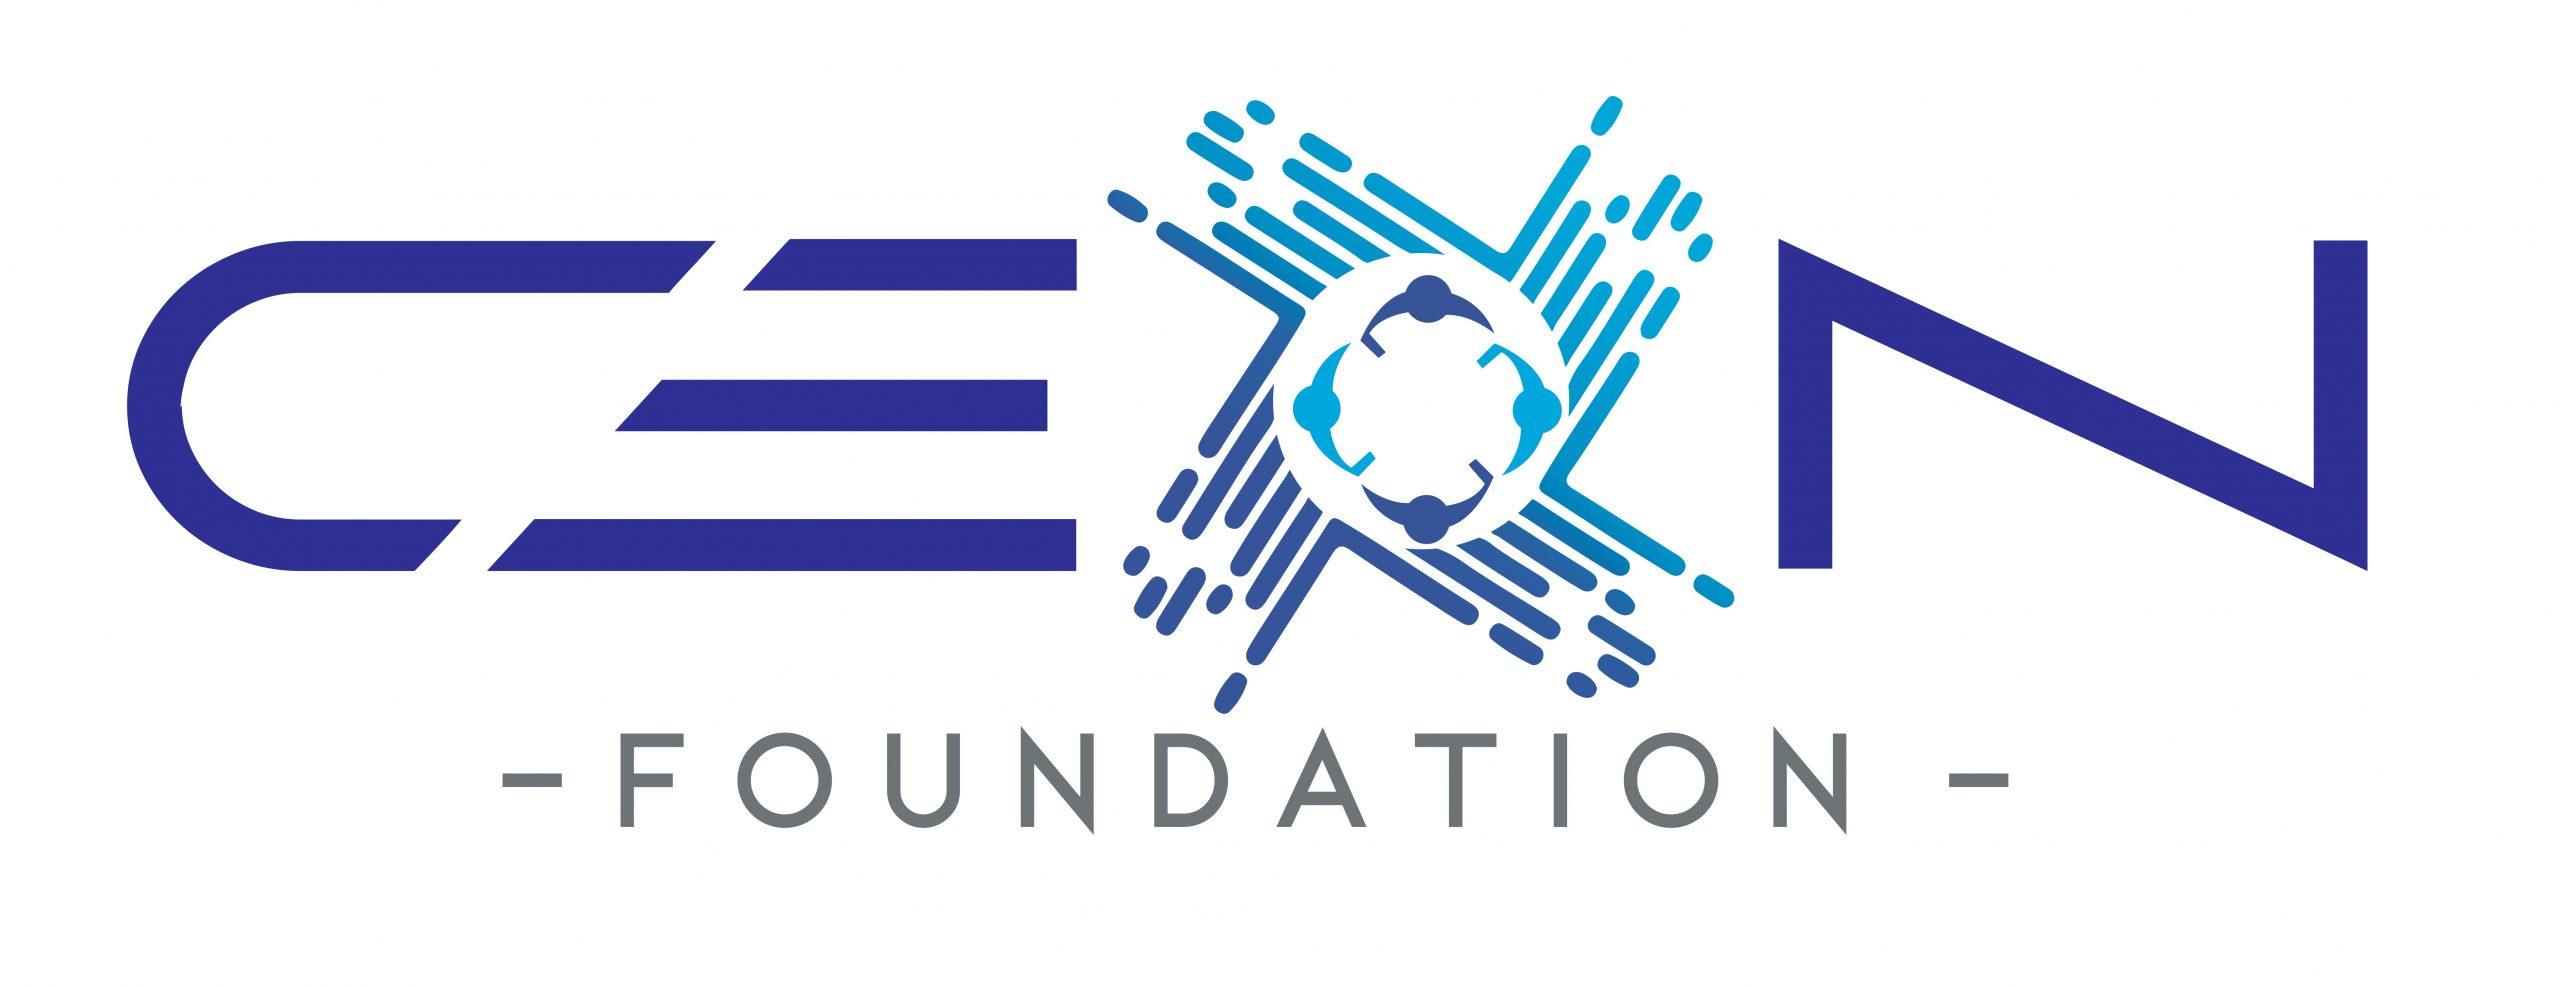 CEON Foundation